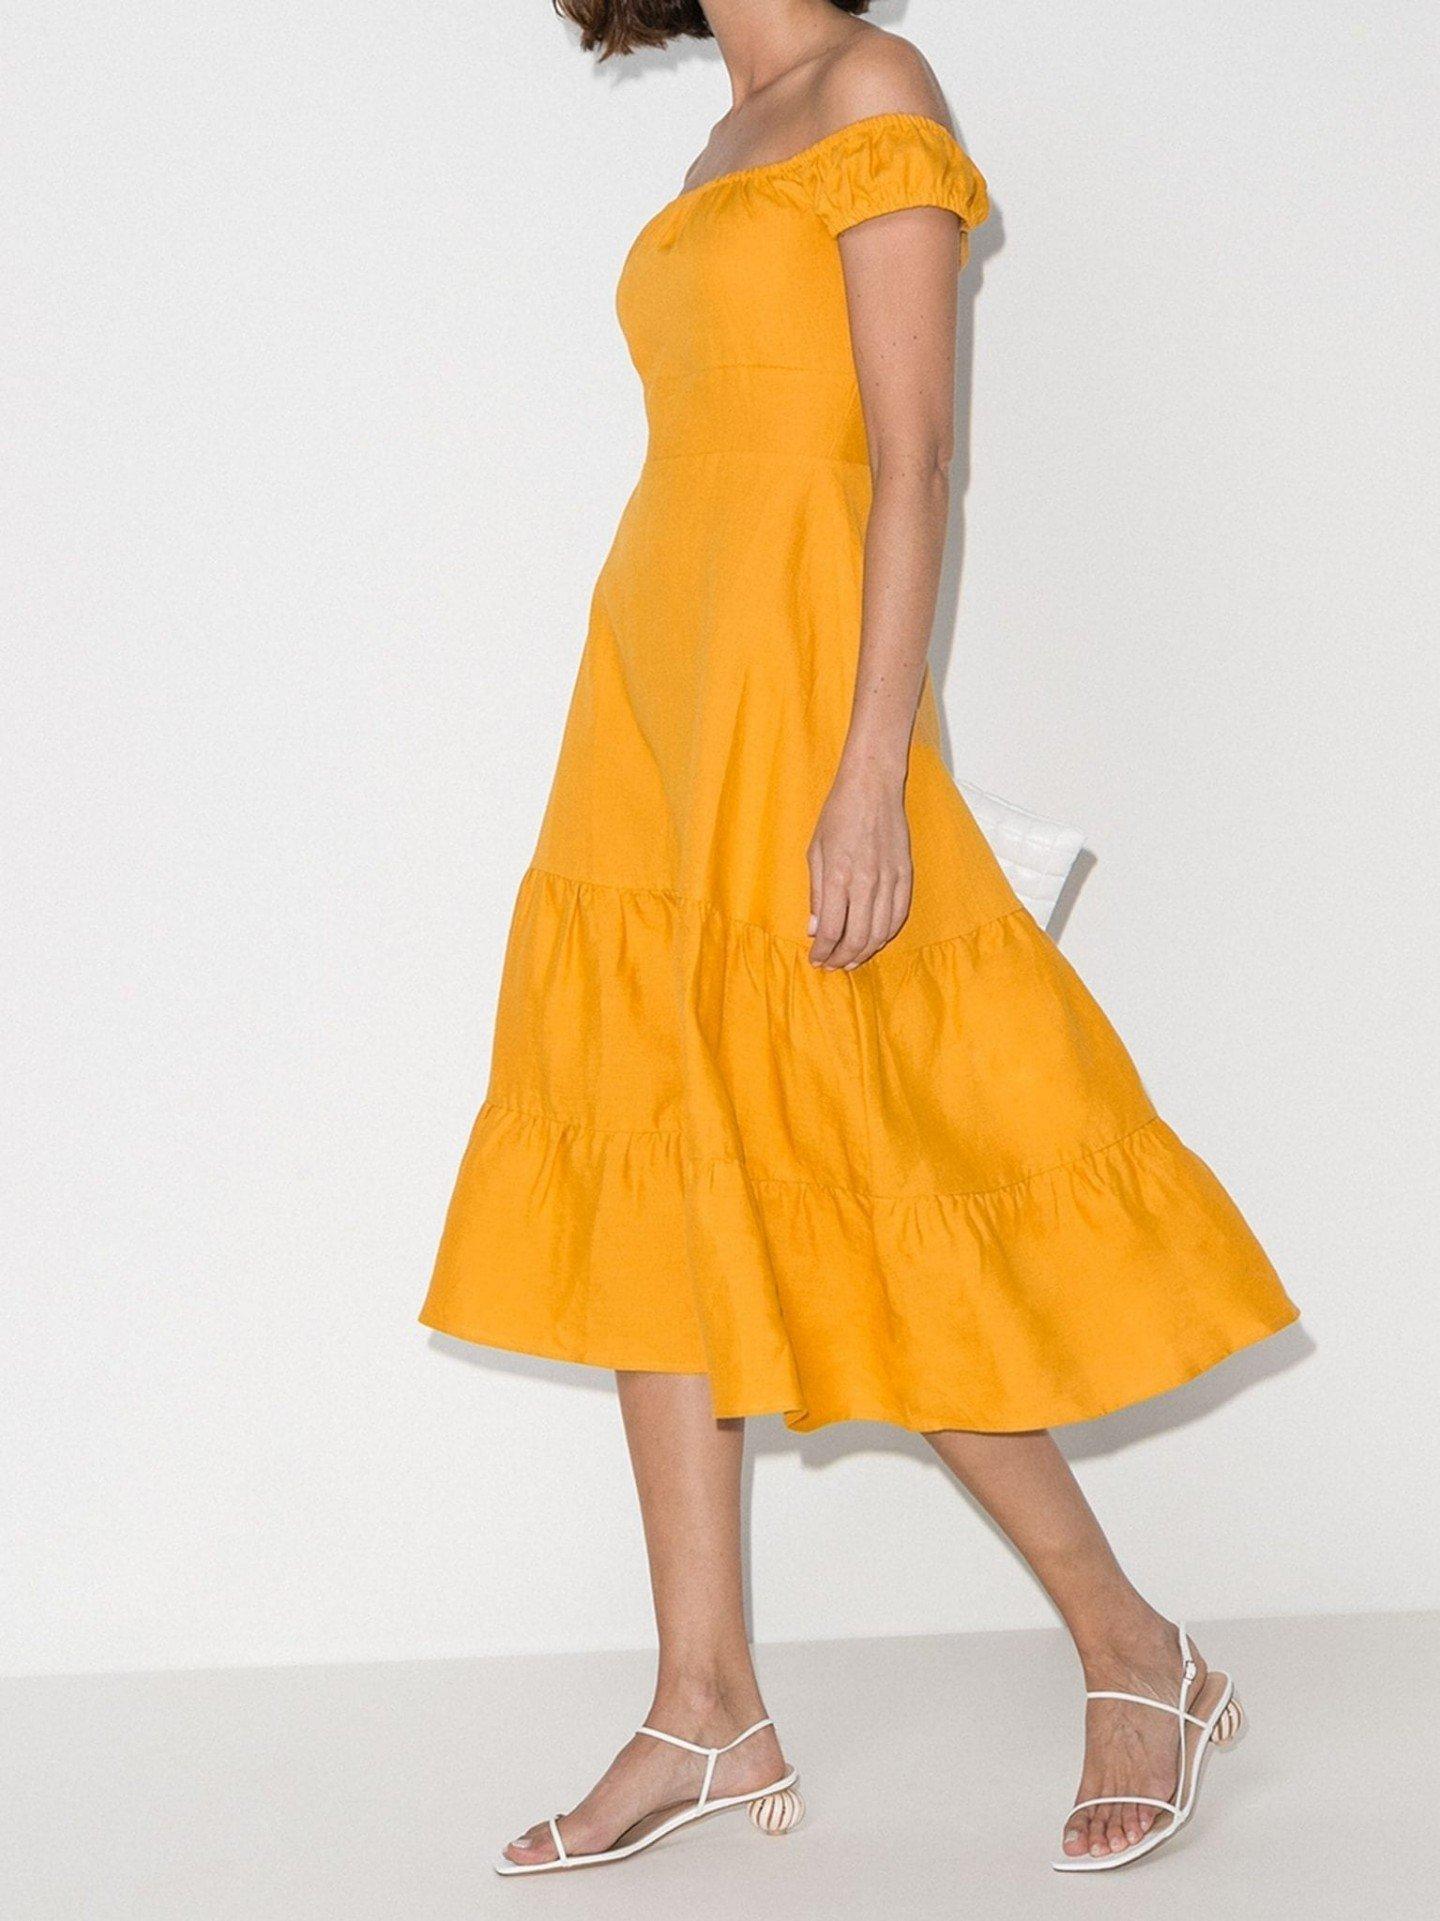 REFORMATION Toulouse Off-The-Shoulder Dress